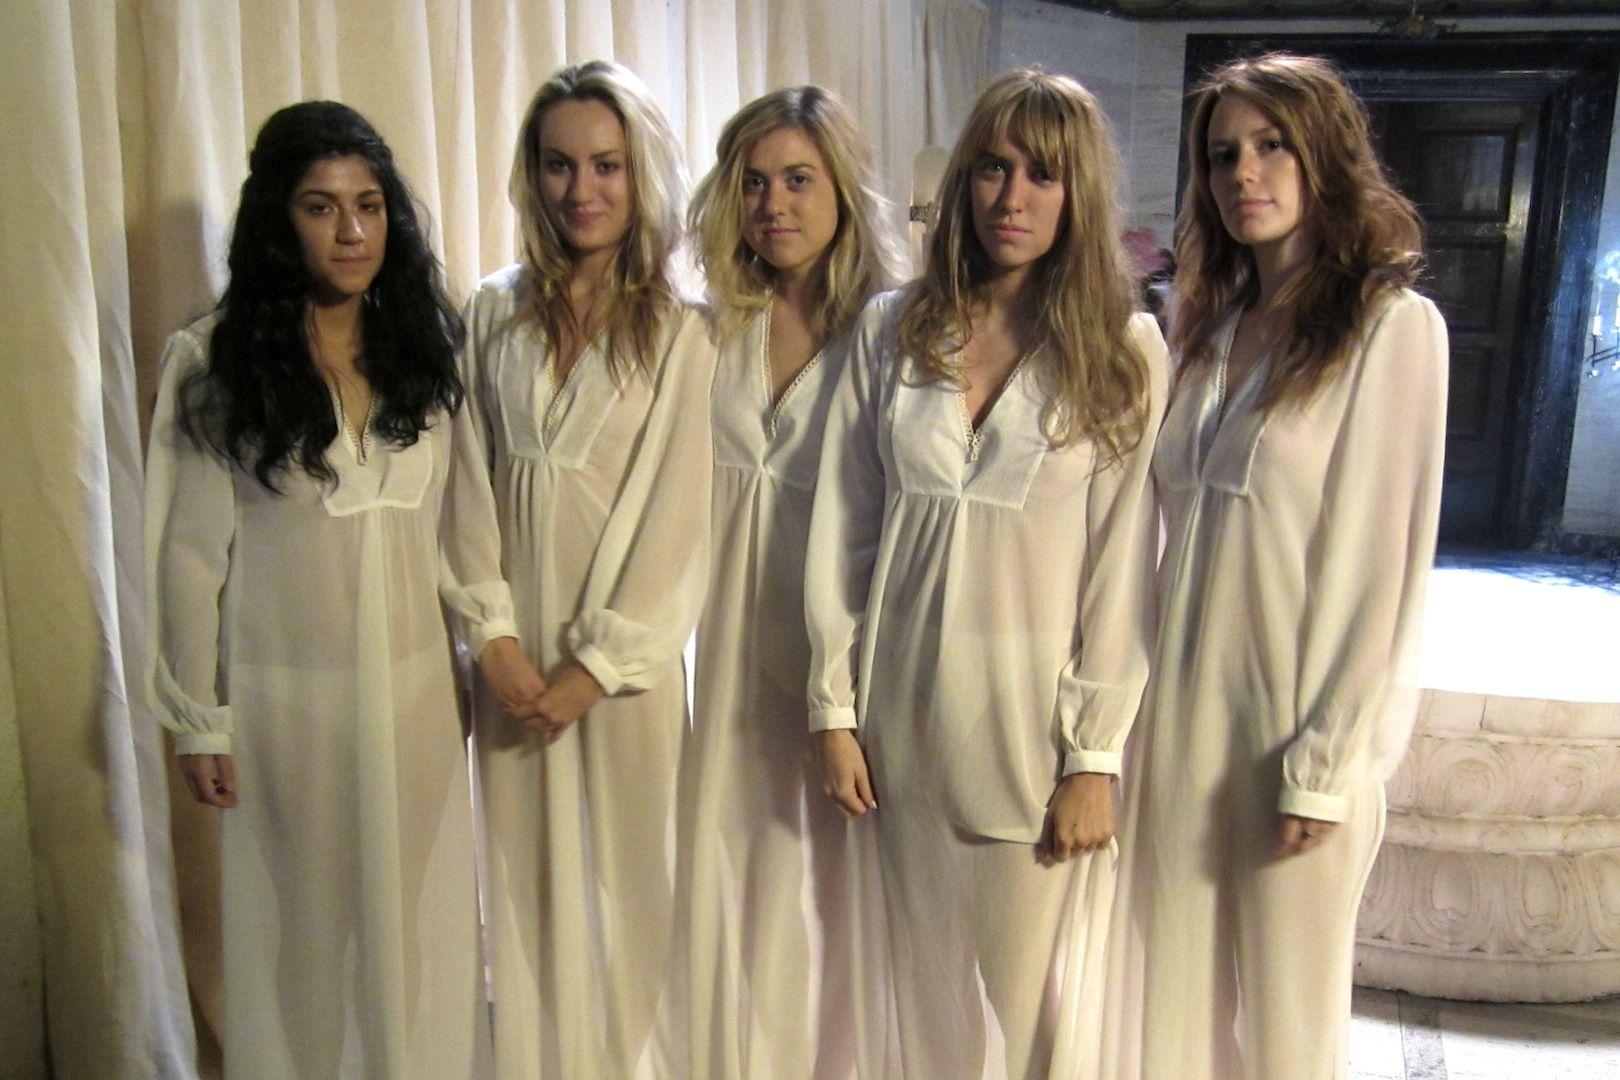 Marisha Ray Wedding.Our Sacrifical Virgins Cat Ferraz Anna Voropaeva Meghan Gibson